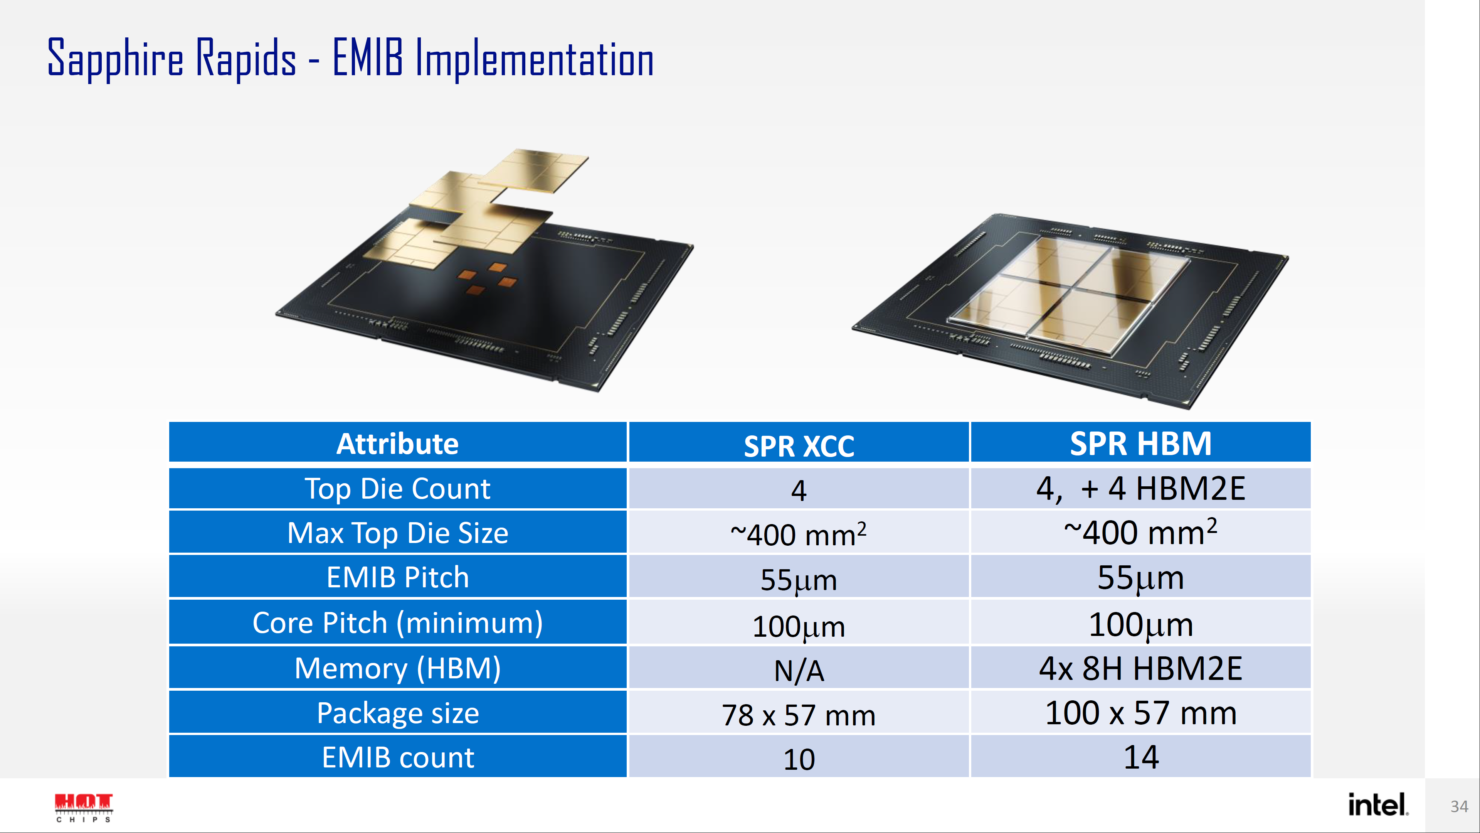 intel-sapphire-rapids-sp-xeon-hbm-cpu-ponte-vecchio-gpu-with-emib-forveros-packaging-technologies-_4